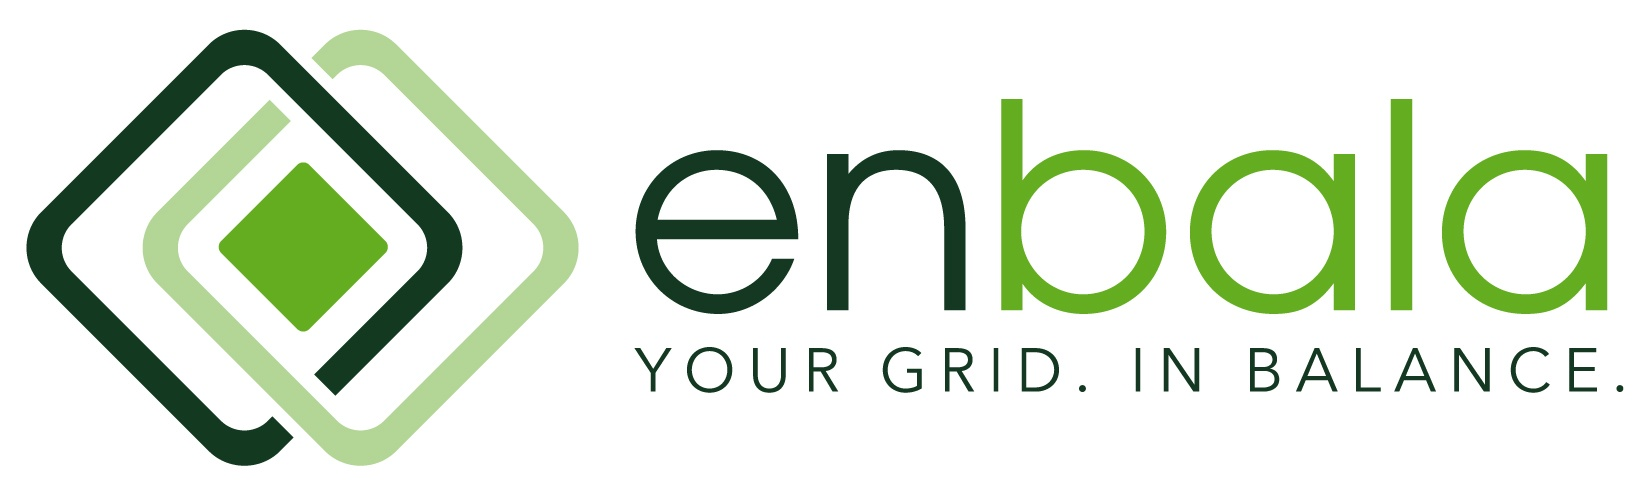 enbala logo white background 2018.jpg